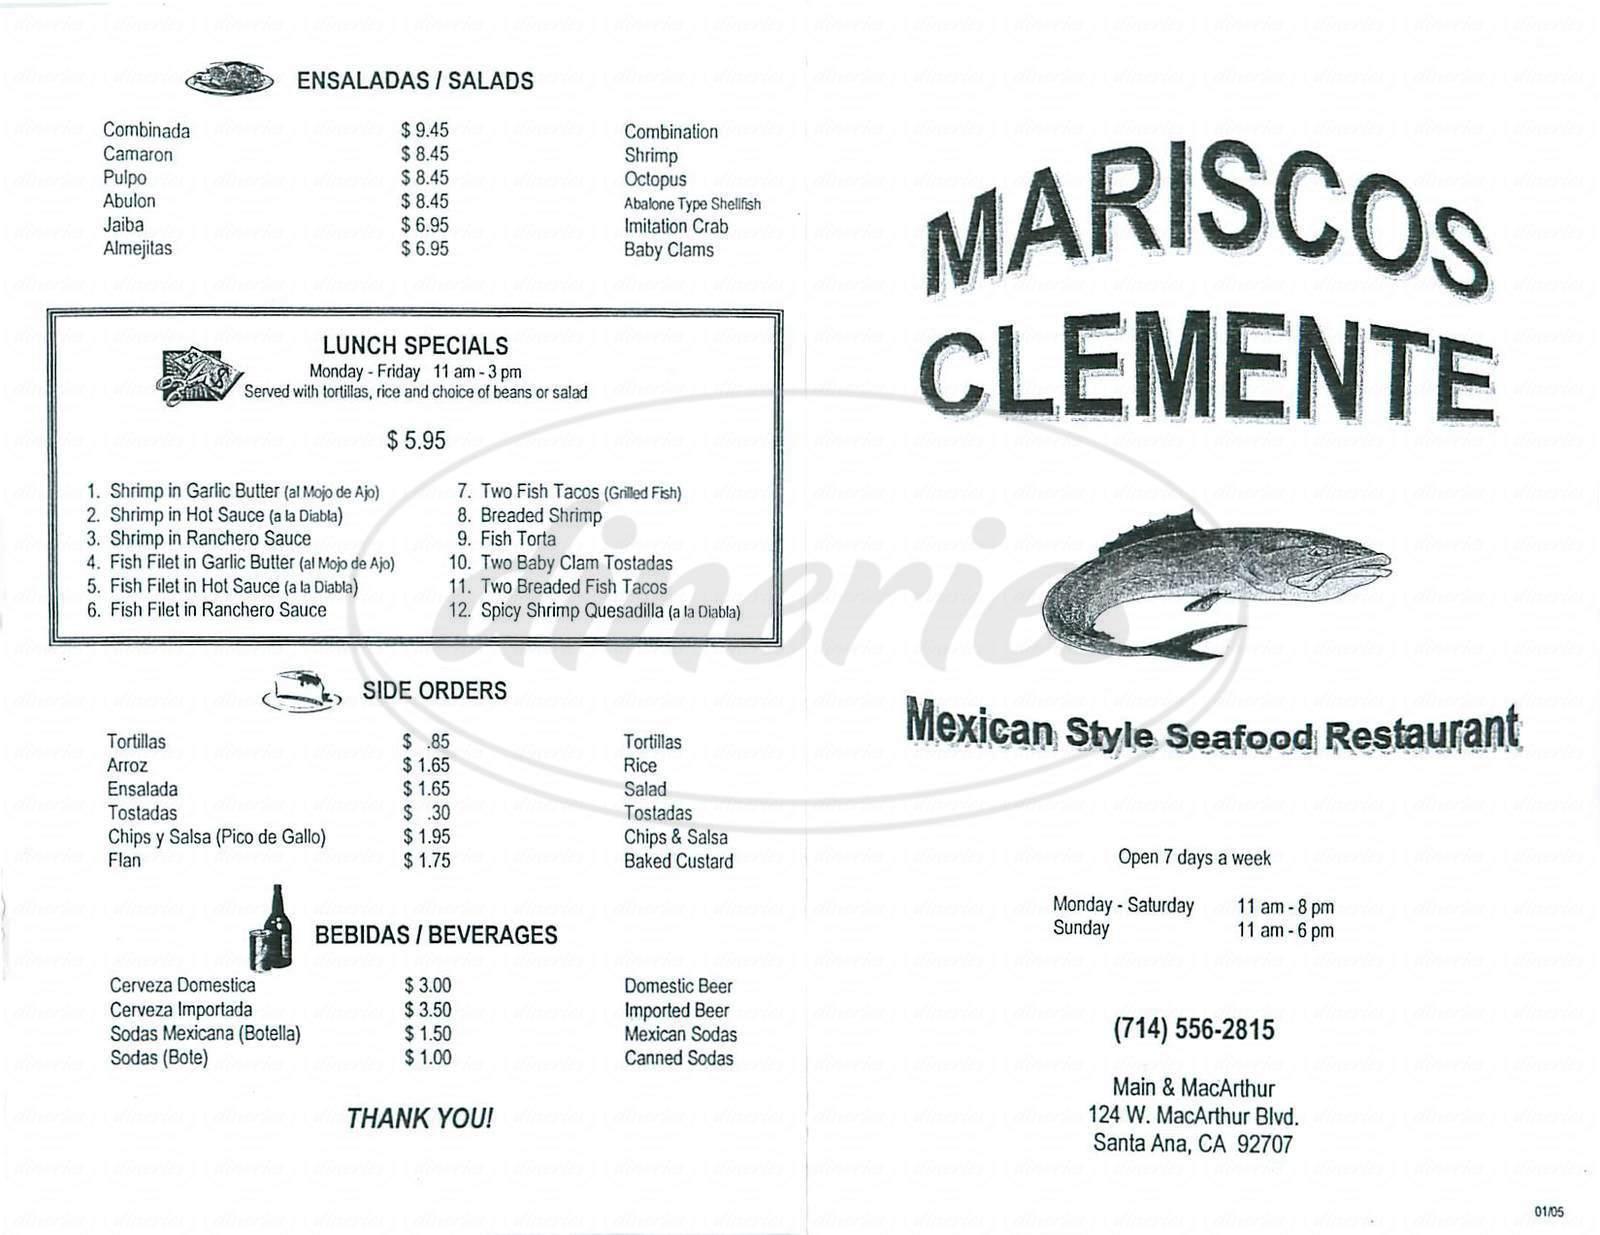 menu for Mariscos Clemente